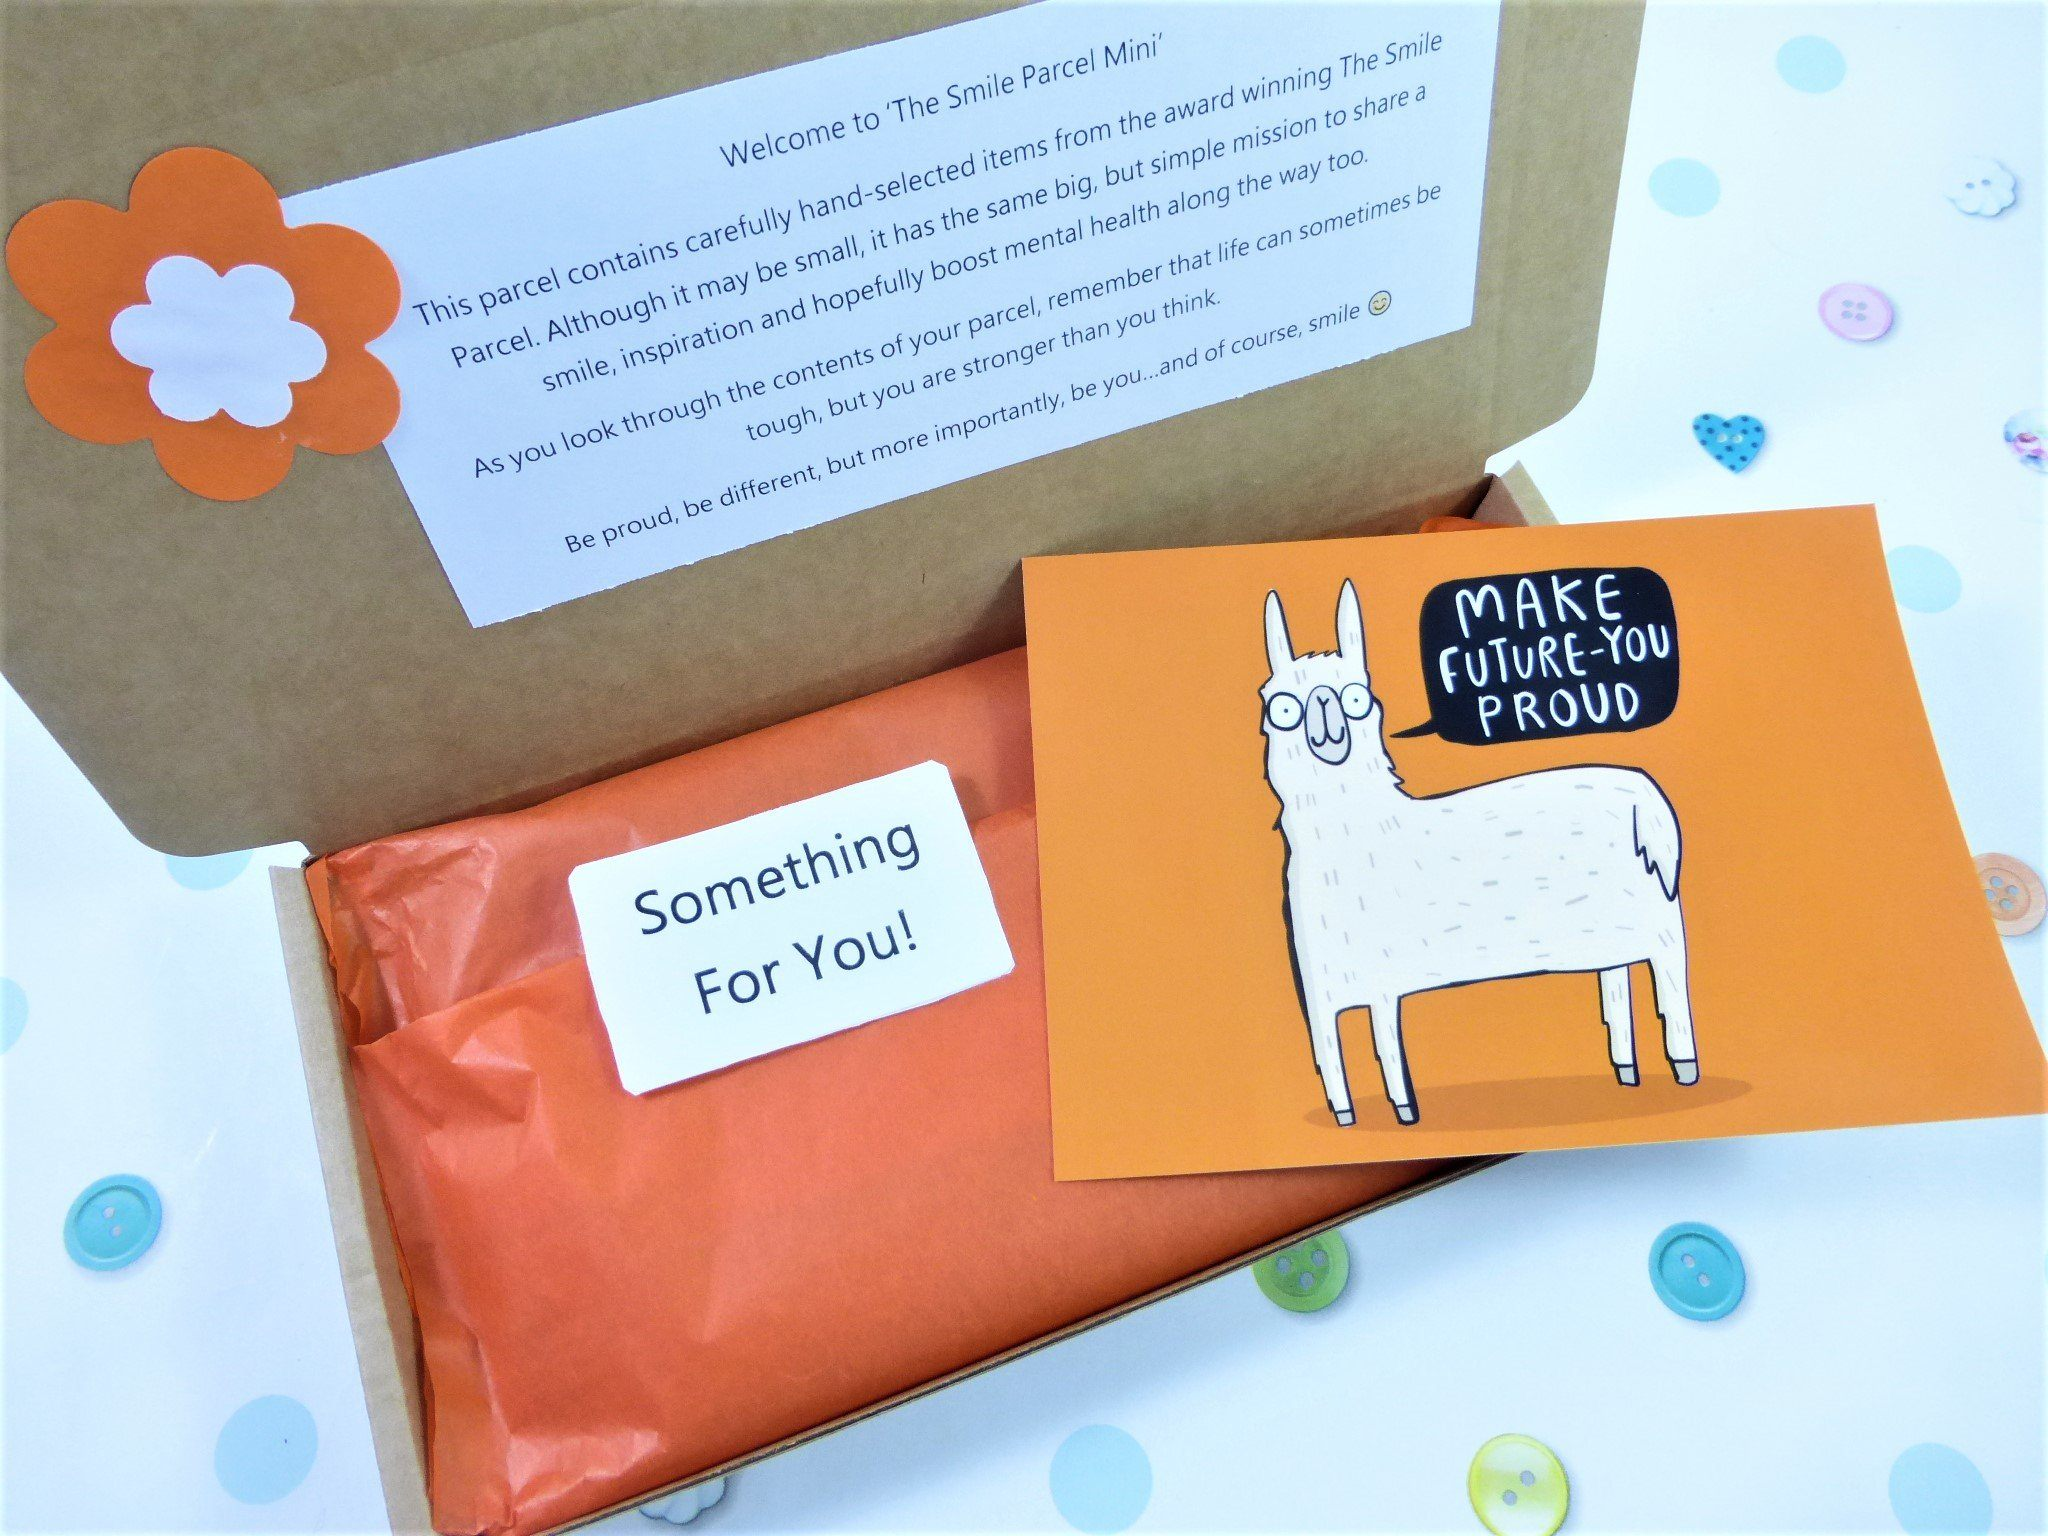 Orange Letterbox Friendly, Pick Me Up Gift, The Smile Parcel Mini, Self Care Box, Happy Post, Mental Health Gift Kind Shop 2